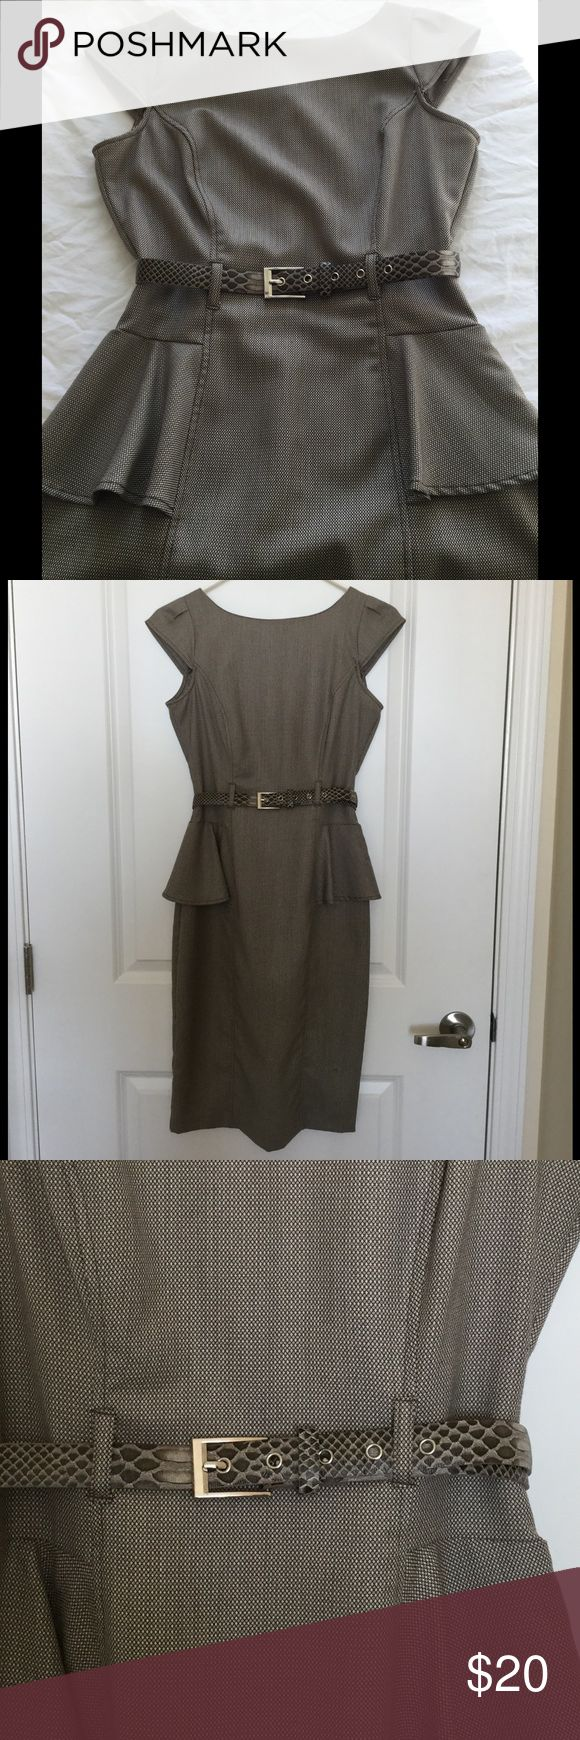 XOXO midi Dress with belt XOXO brown/tan peplum midi Dress. XOXO Dresses Midi